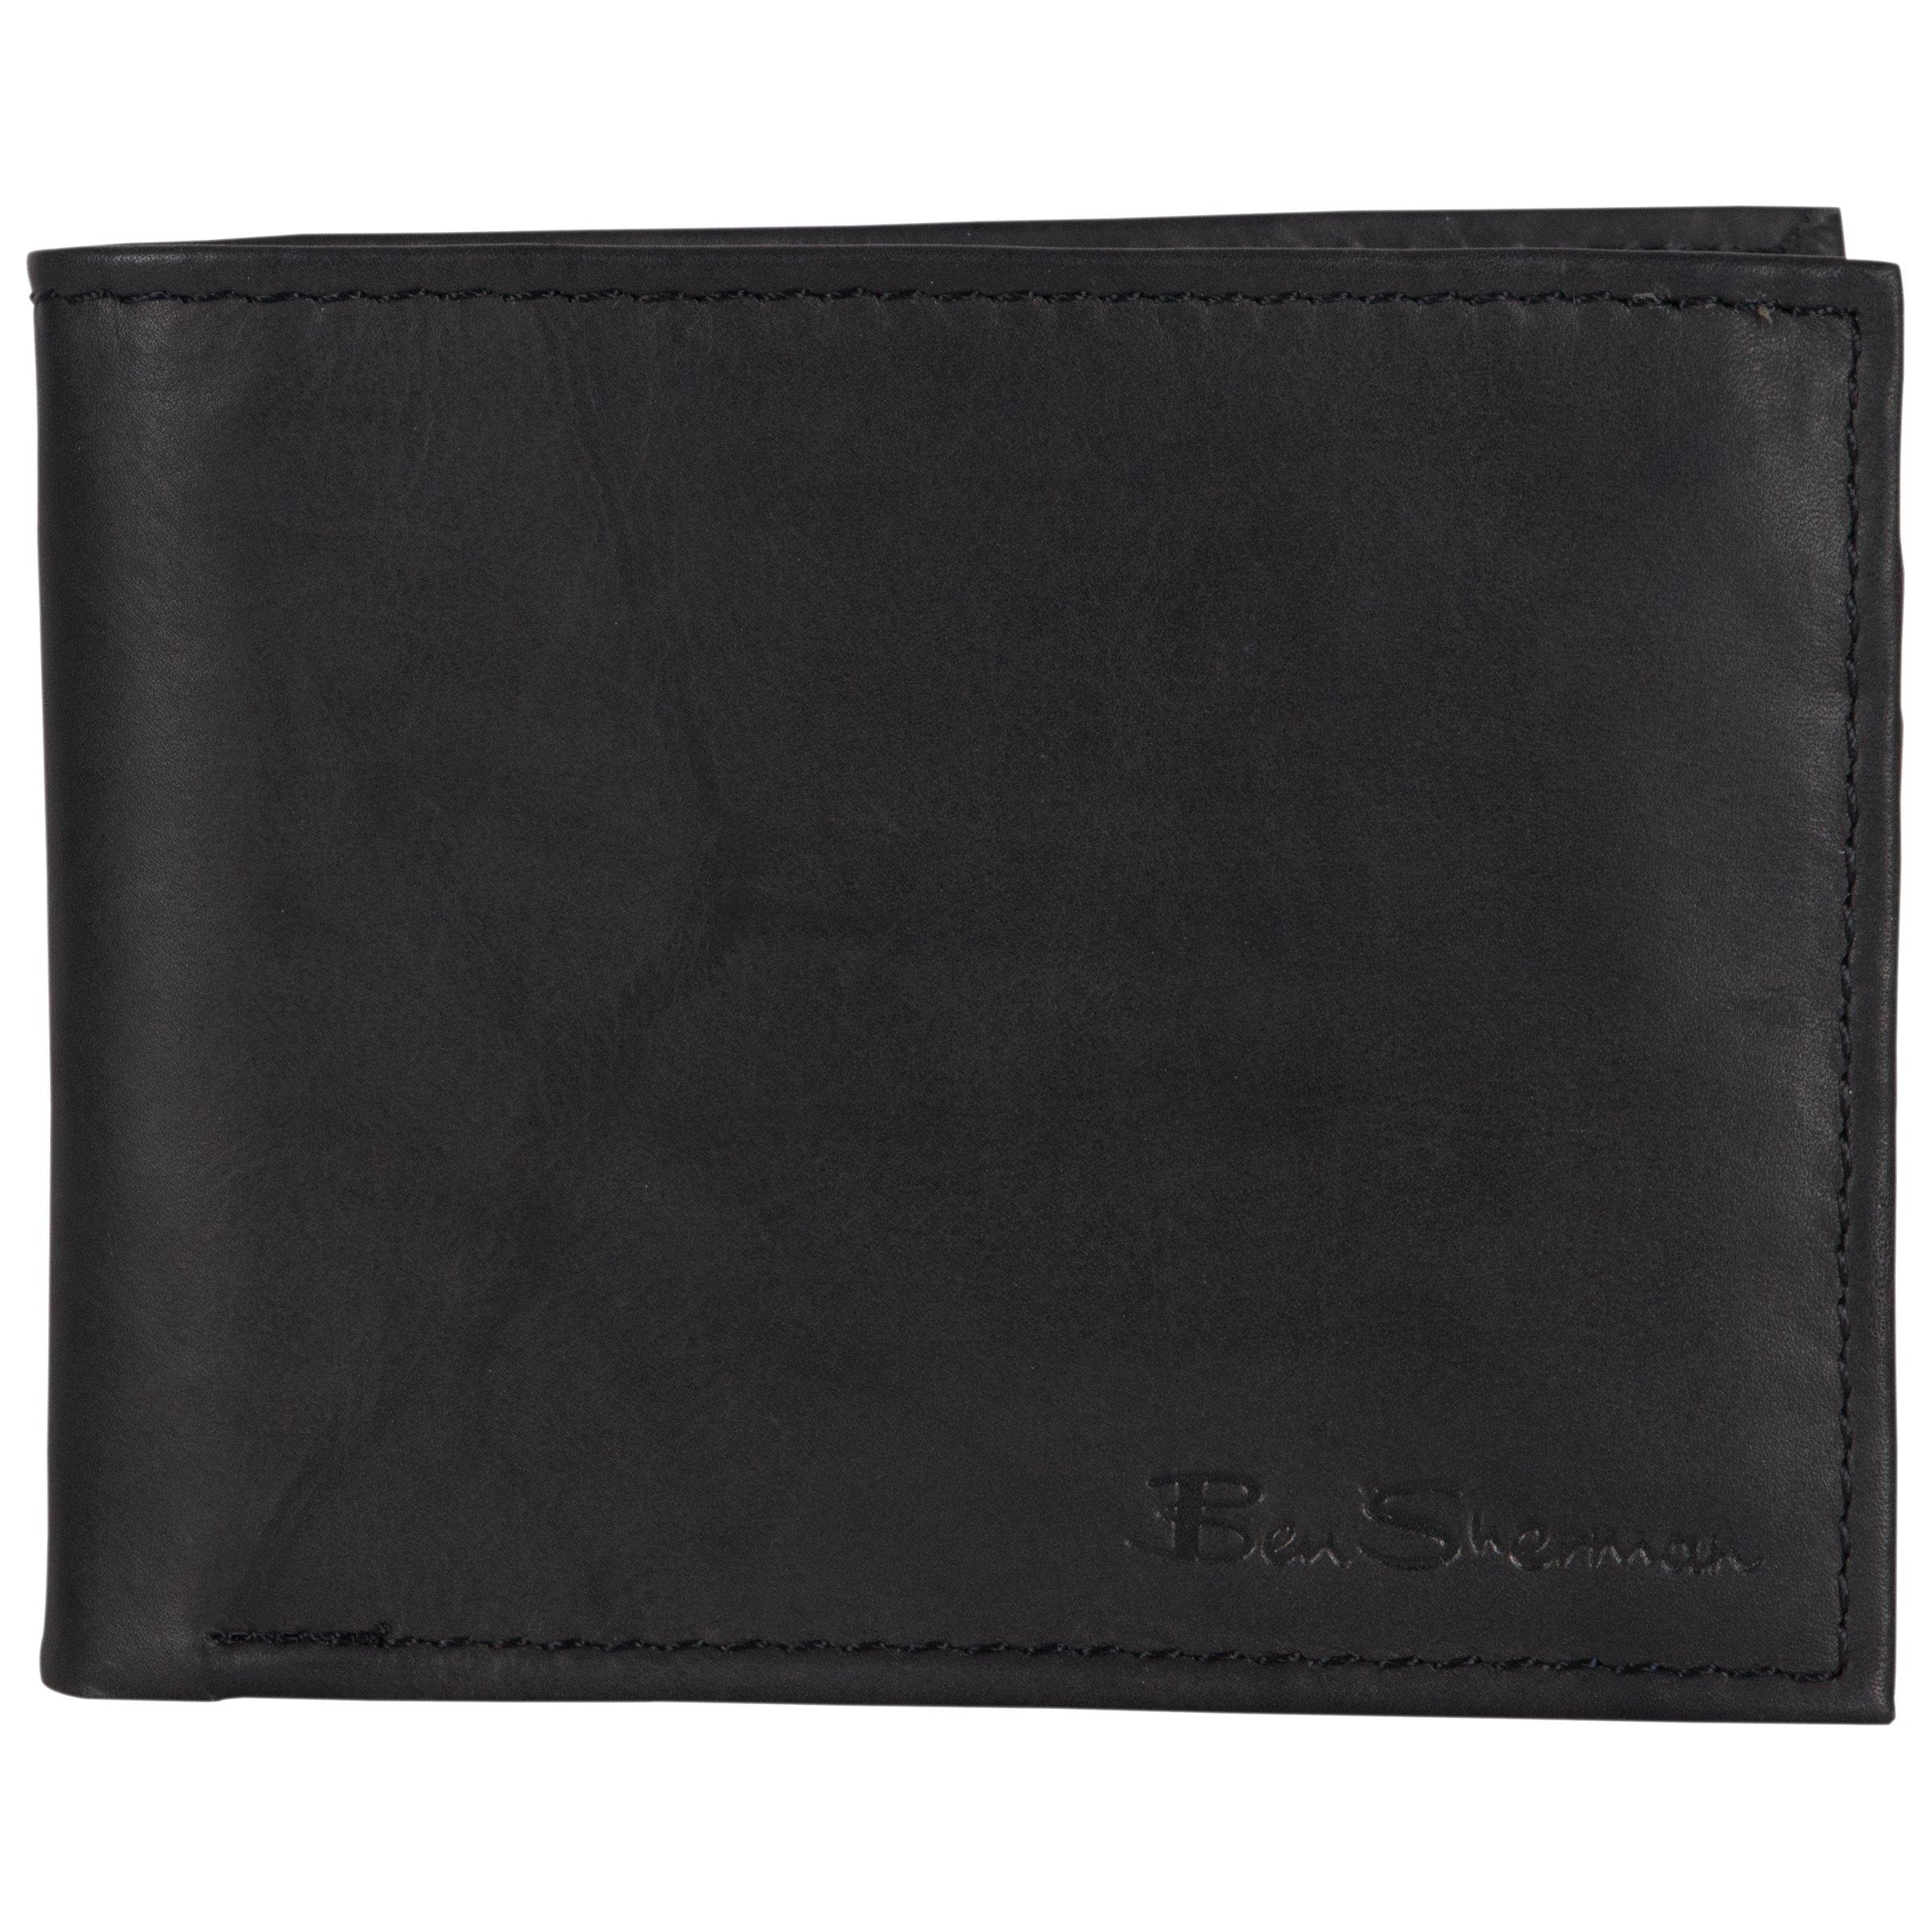 Ben Sherman Men's Leather Five Pocket Bifold Wallet with Id Window (Rfid), Black